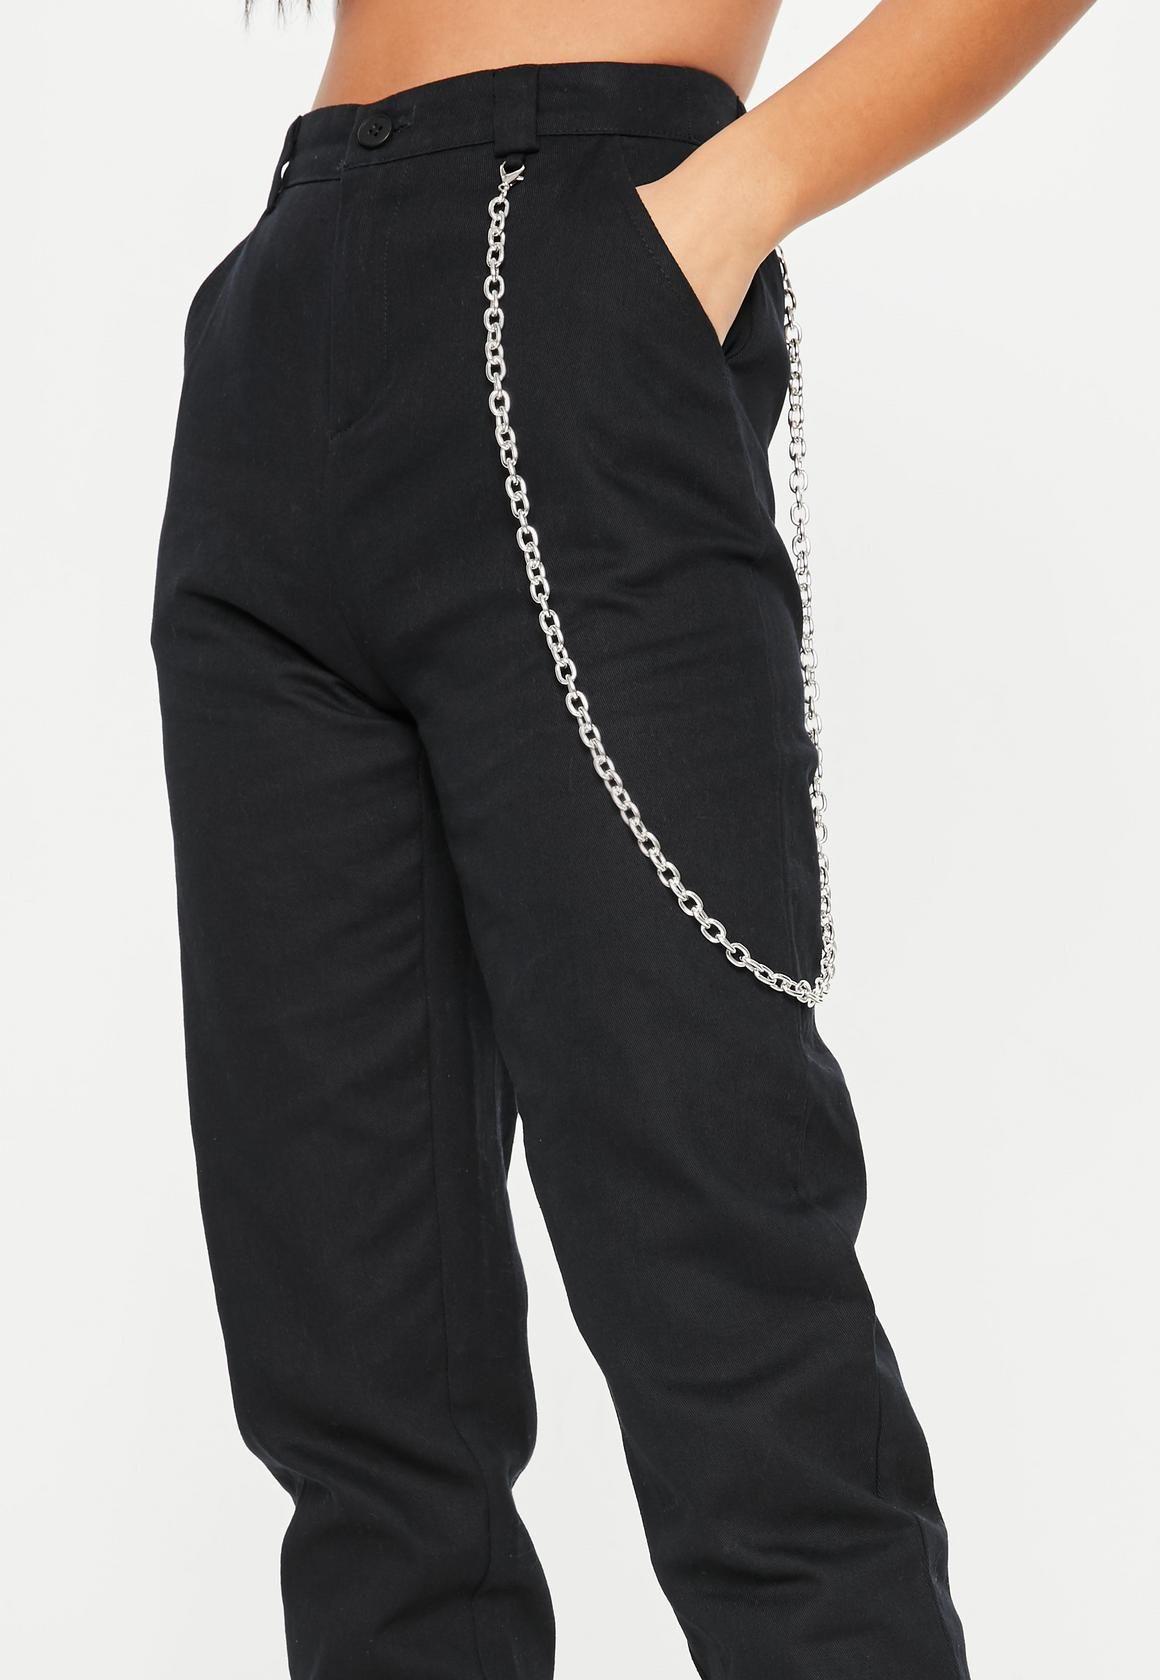 416ab564236b2 Black Chain Detail Cargo Pants